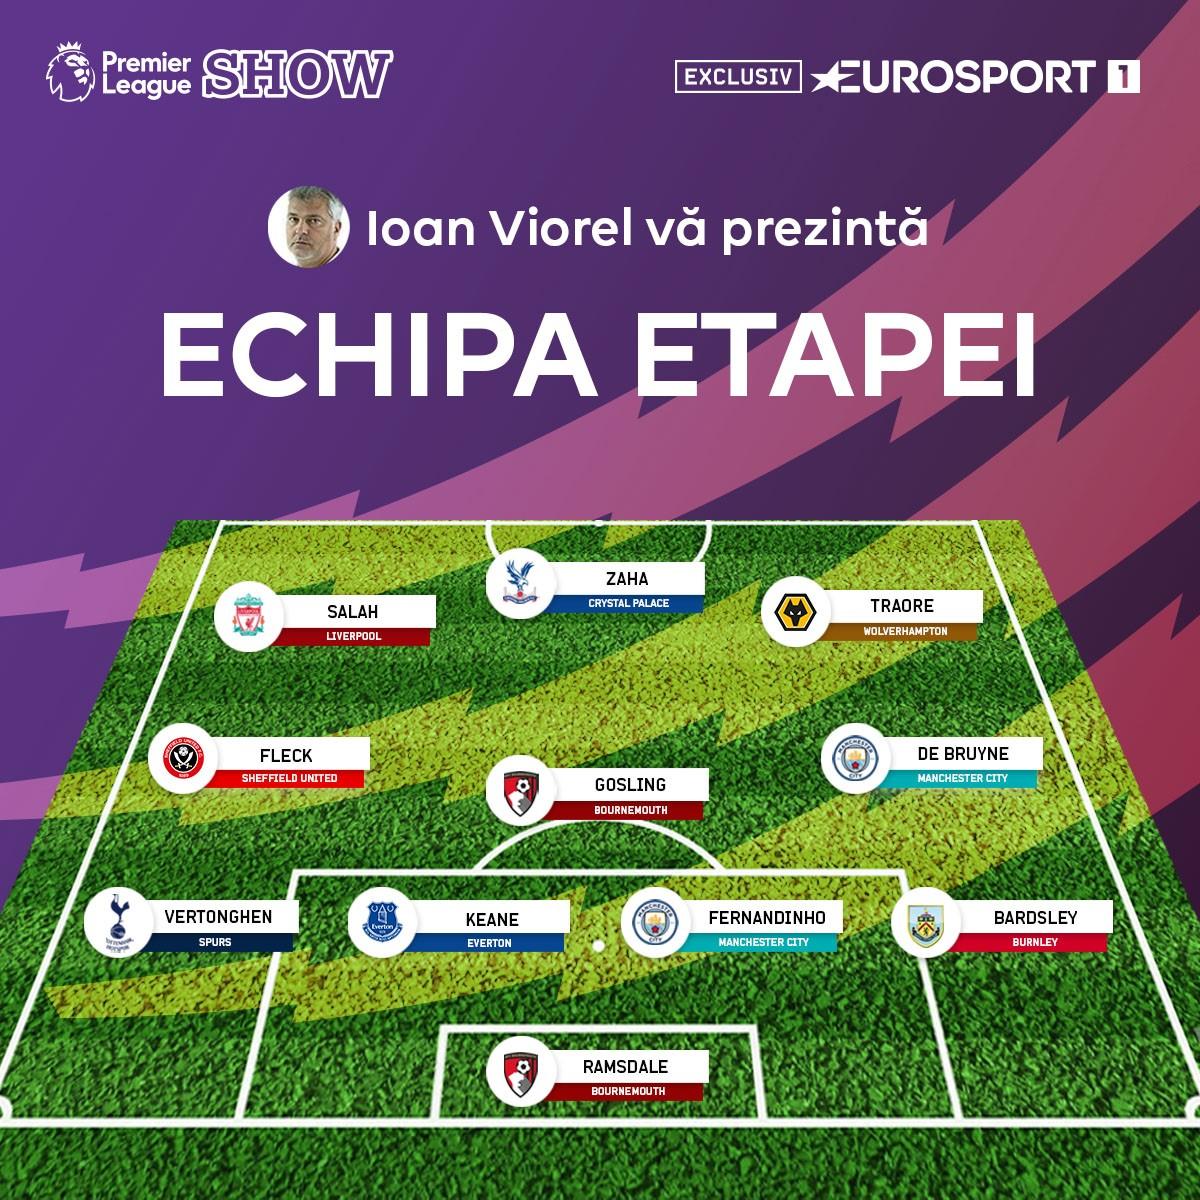 https://i.eurosport.com/2019/12/18/2738823.jpg